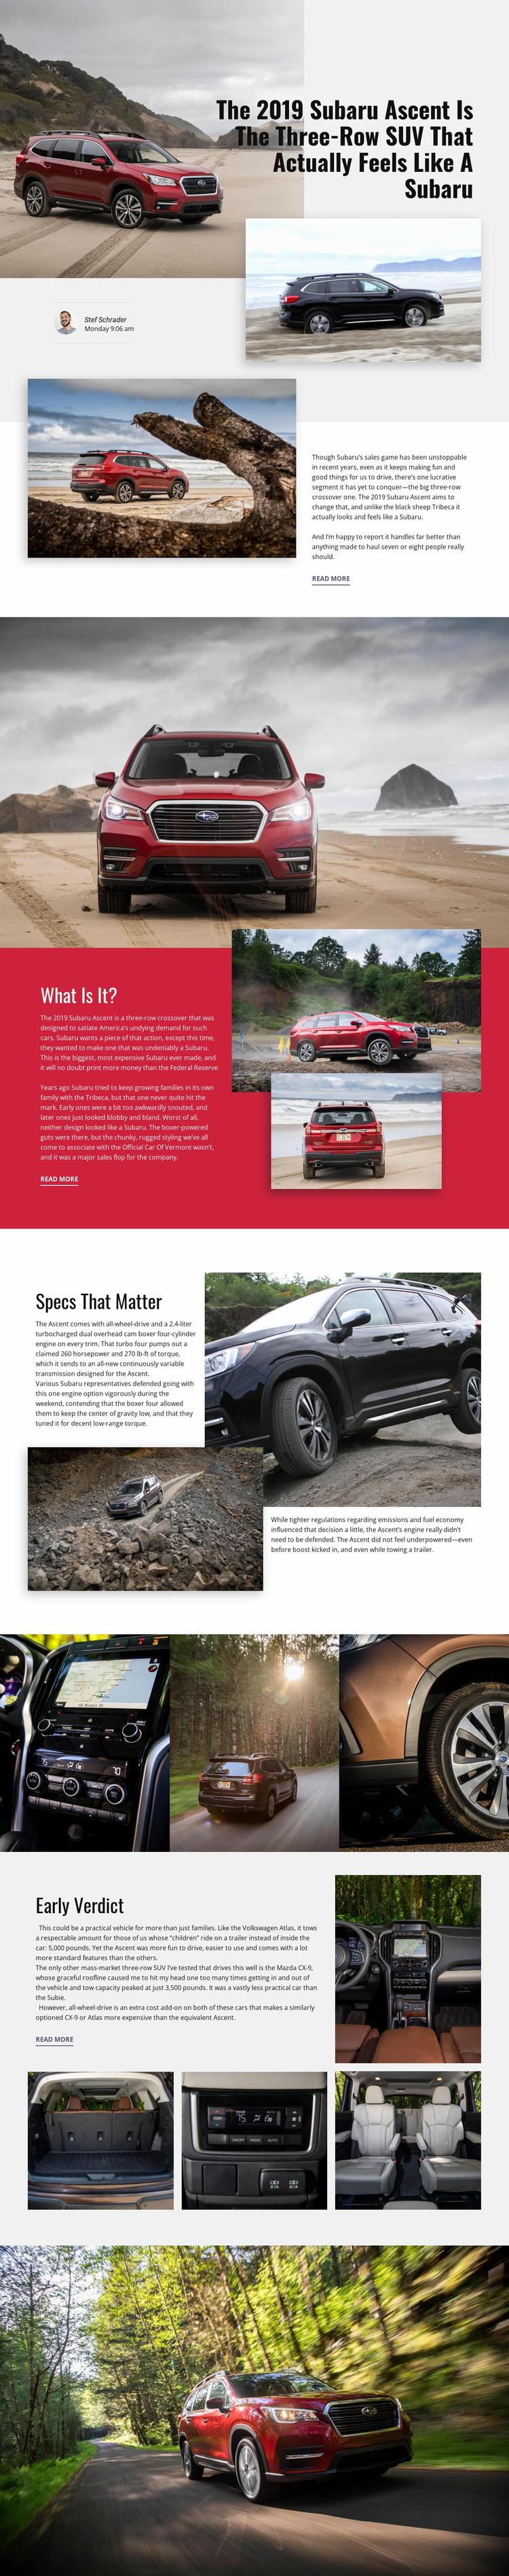 Subaru Website Design